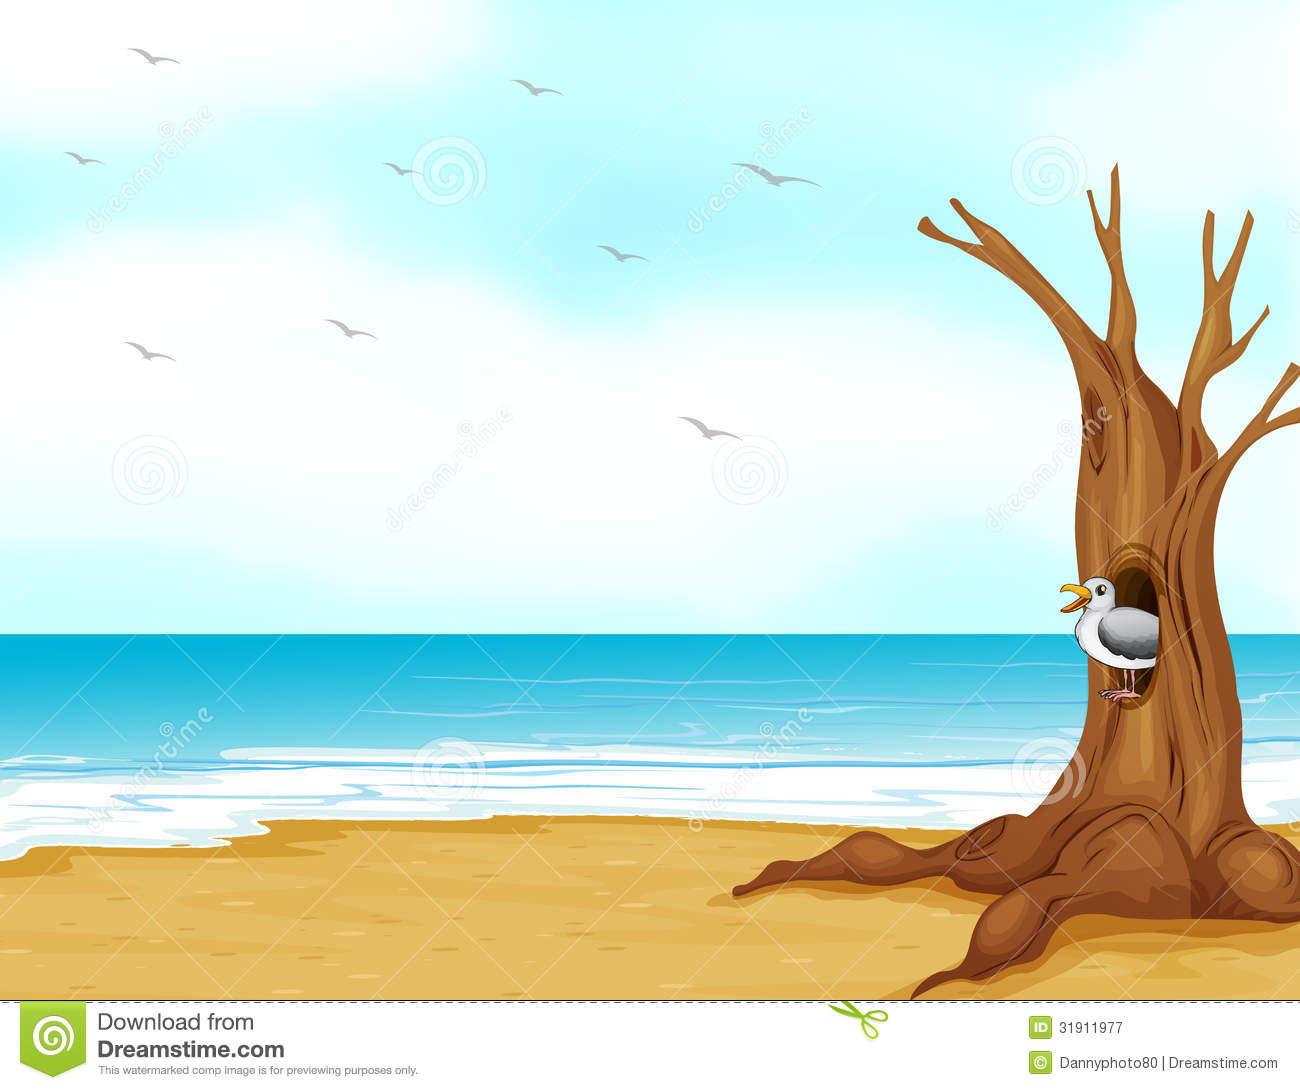 Seashore images clipart.